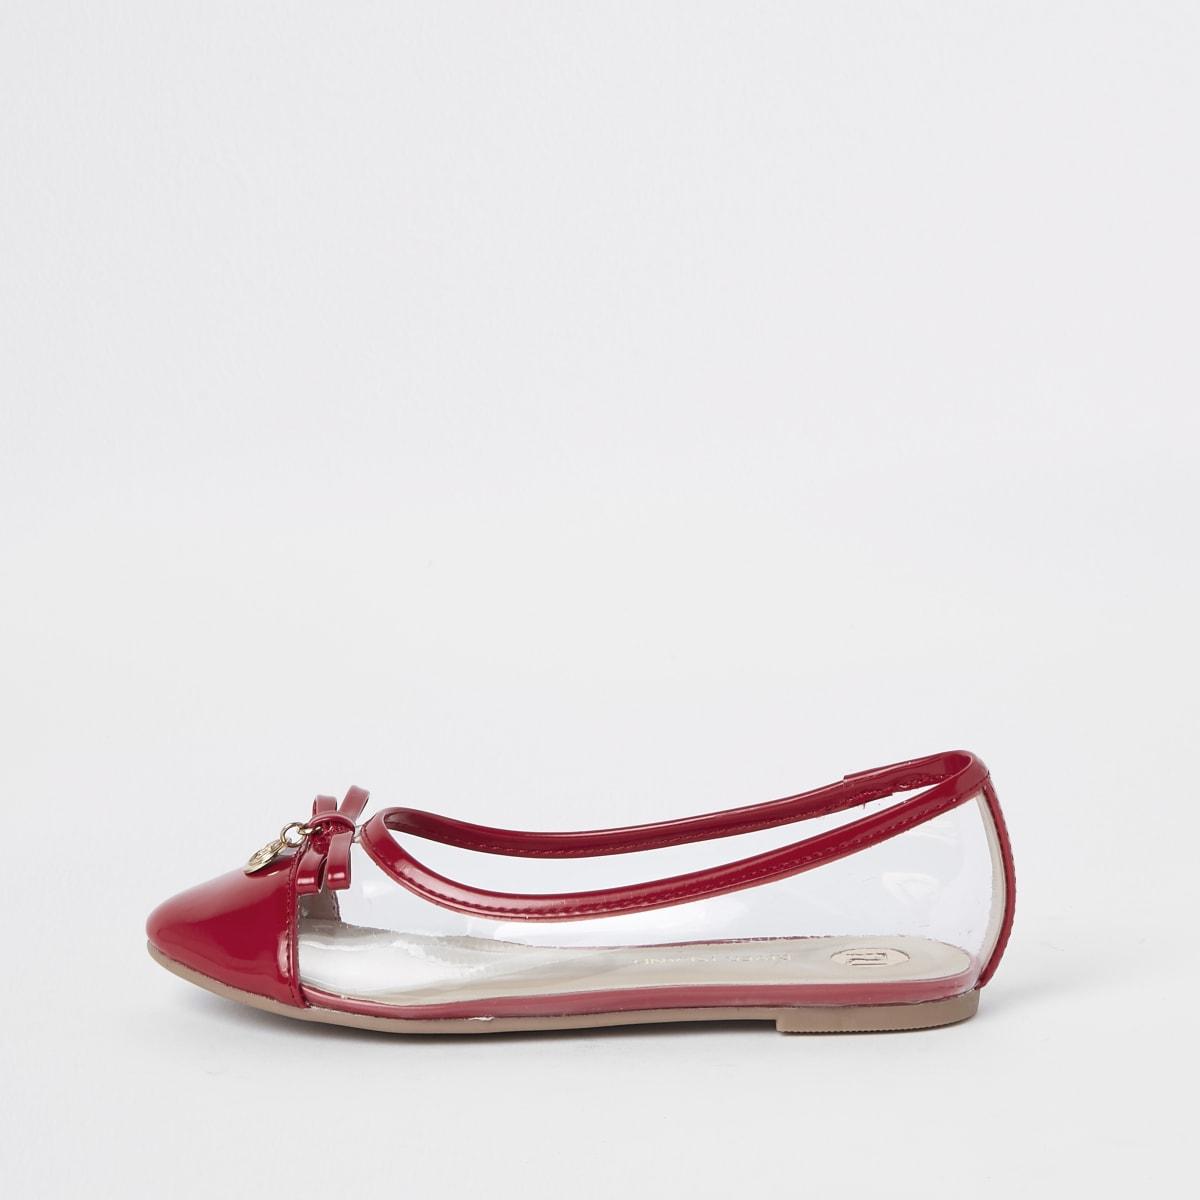 Girls red perspex ballet flats